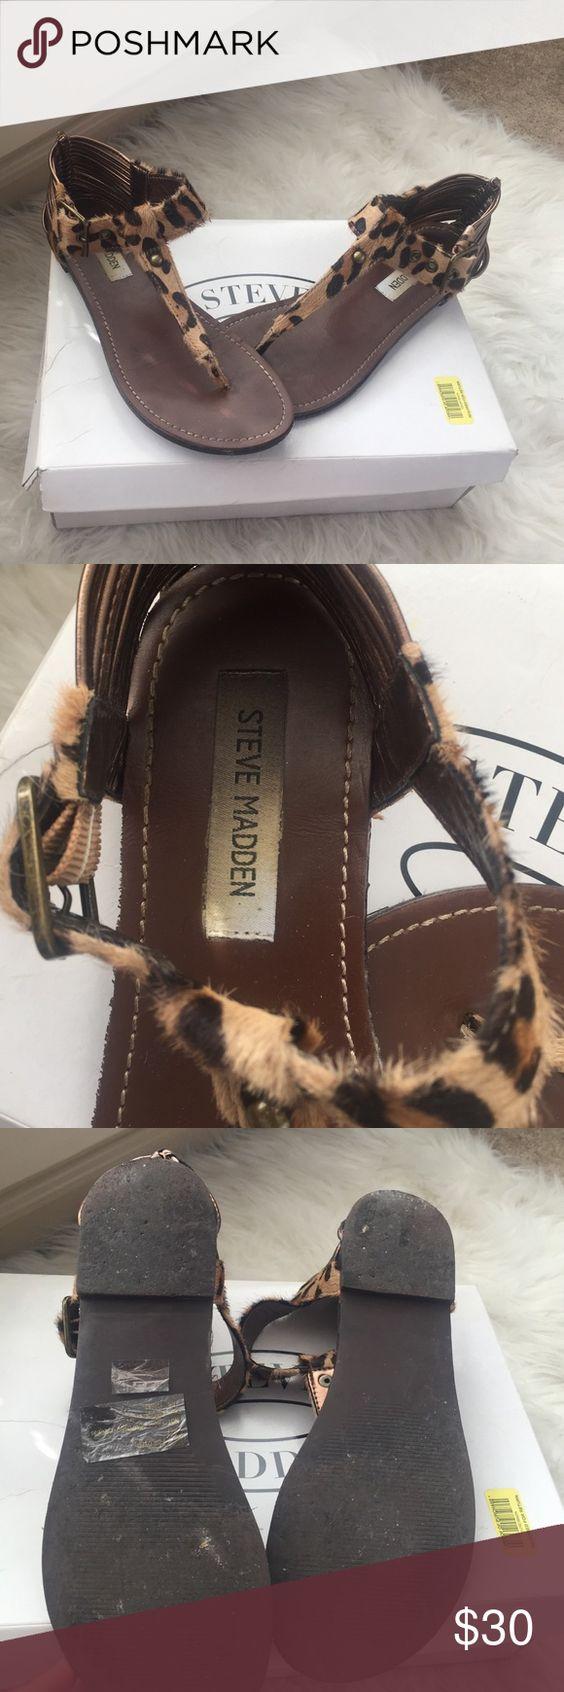 Leopard Print Sandals Cowhair sandals, cute for summer fun! Steve Madden Shoes Sandals